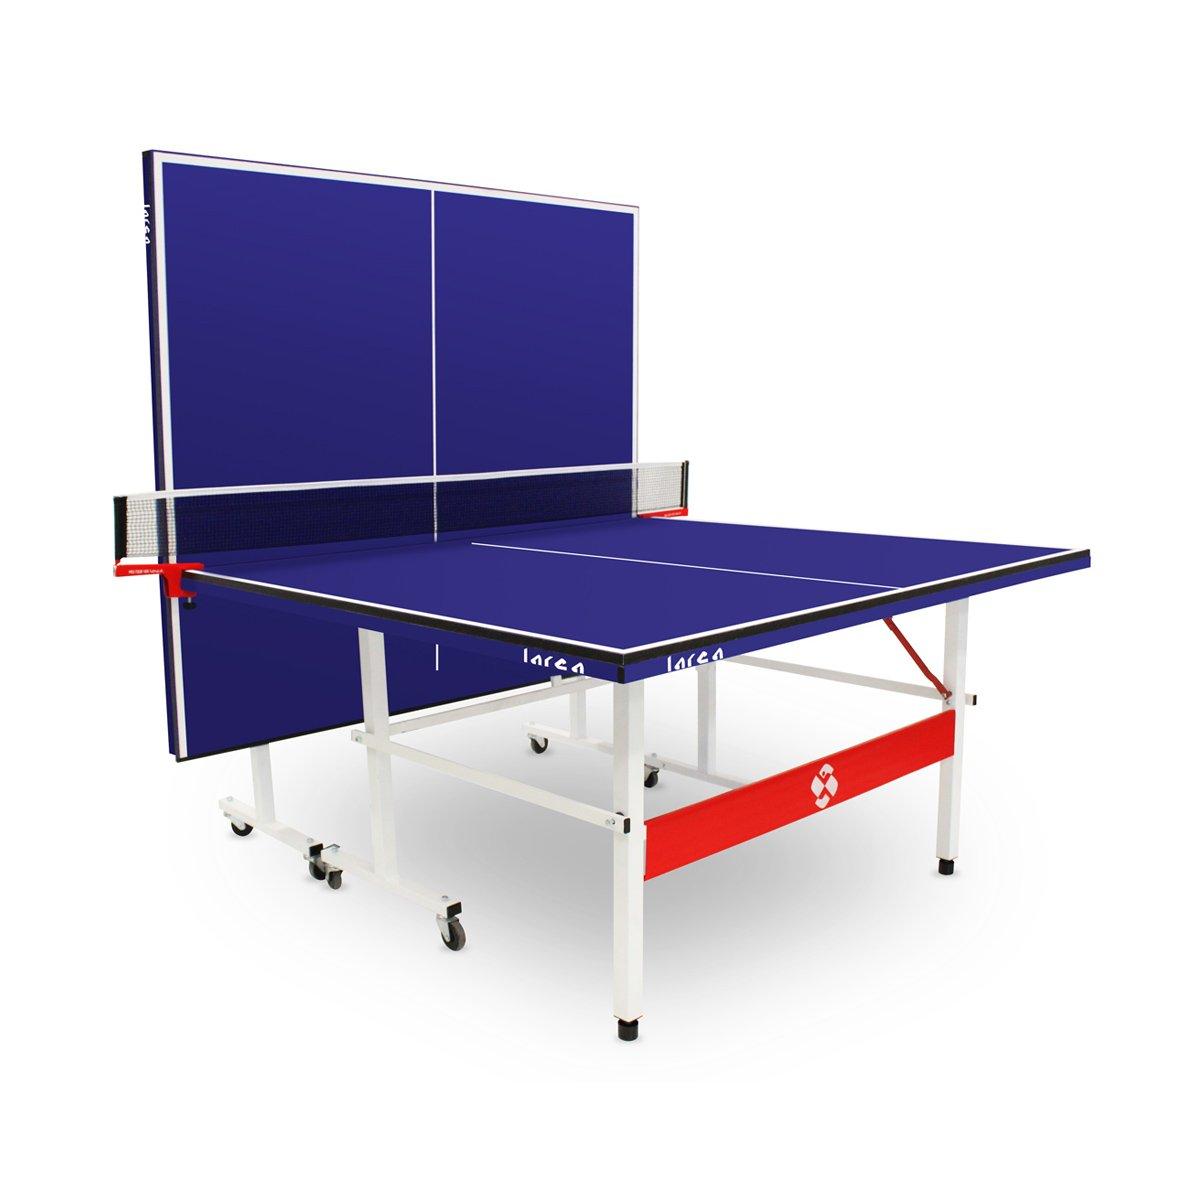 Mesa de ping pong inifinite championship larca sears com mx me entiende - Mesa de ping pong precio ...